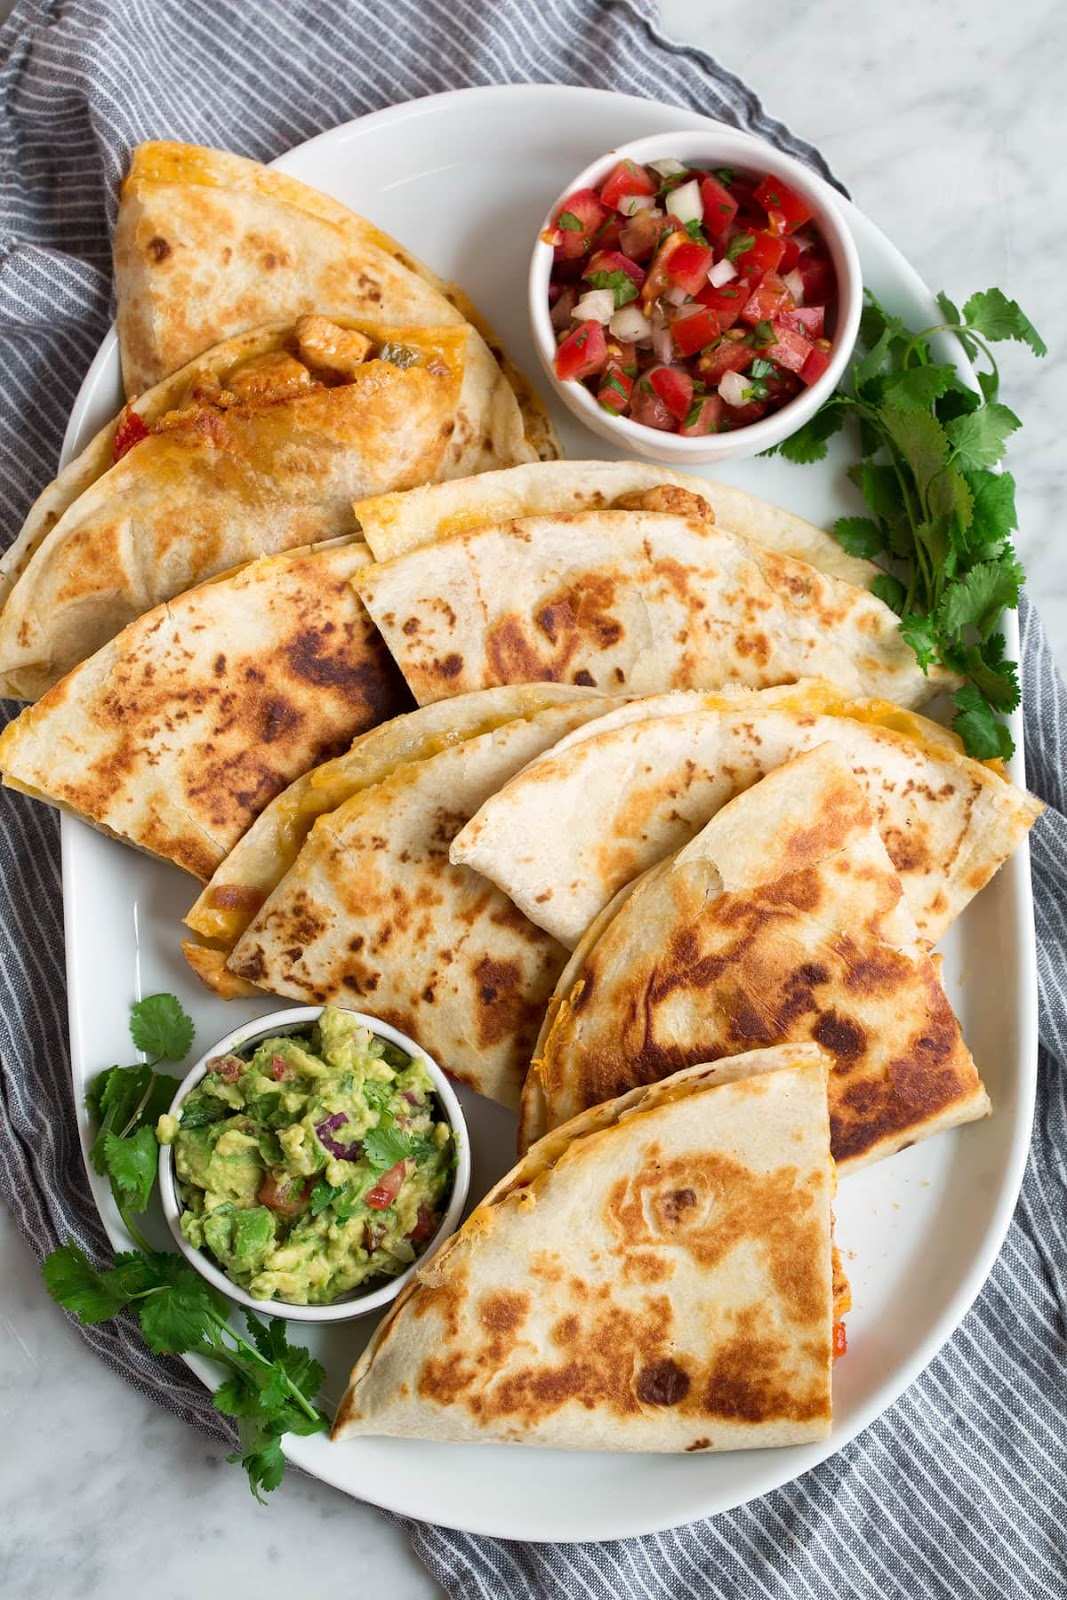 Quesadillas #healthydiet #paleo #keto #whole30 #lowcarb